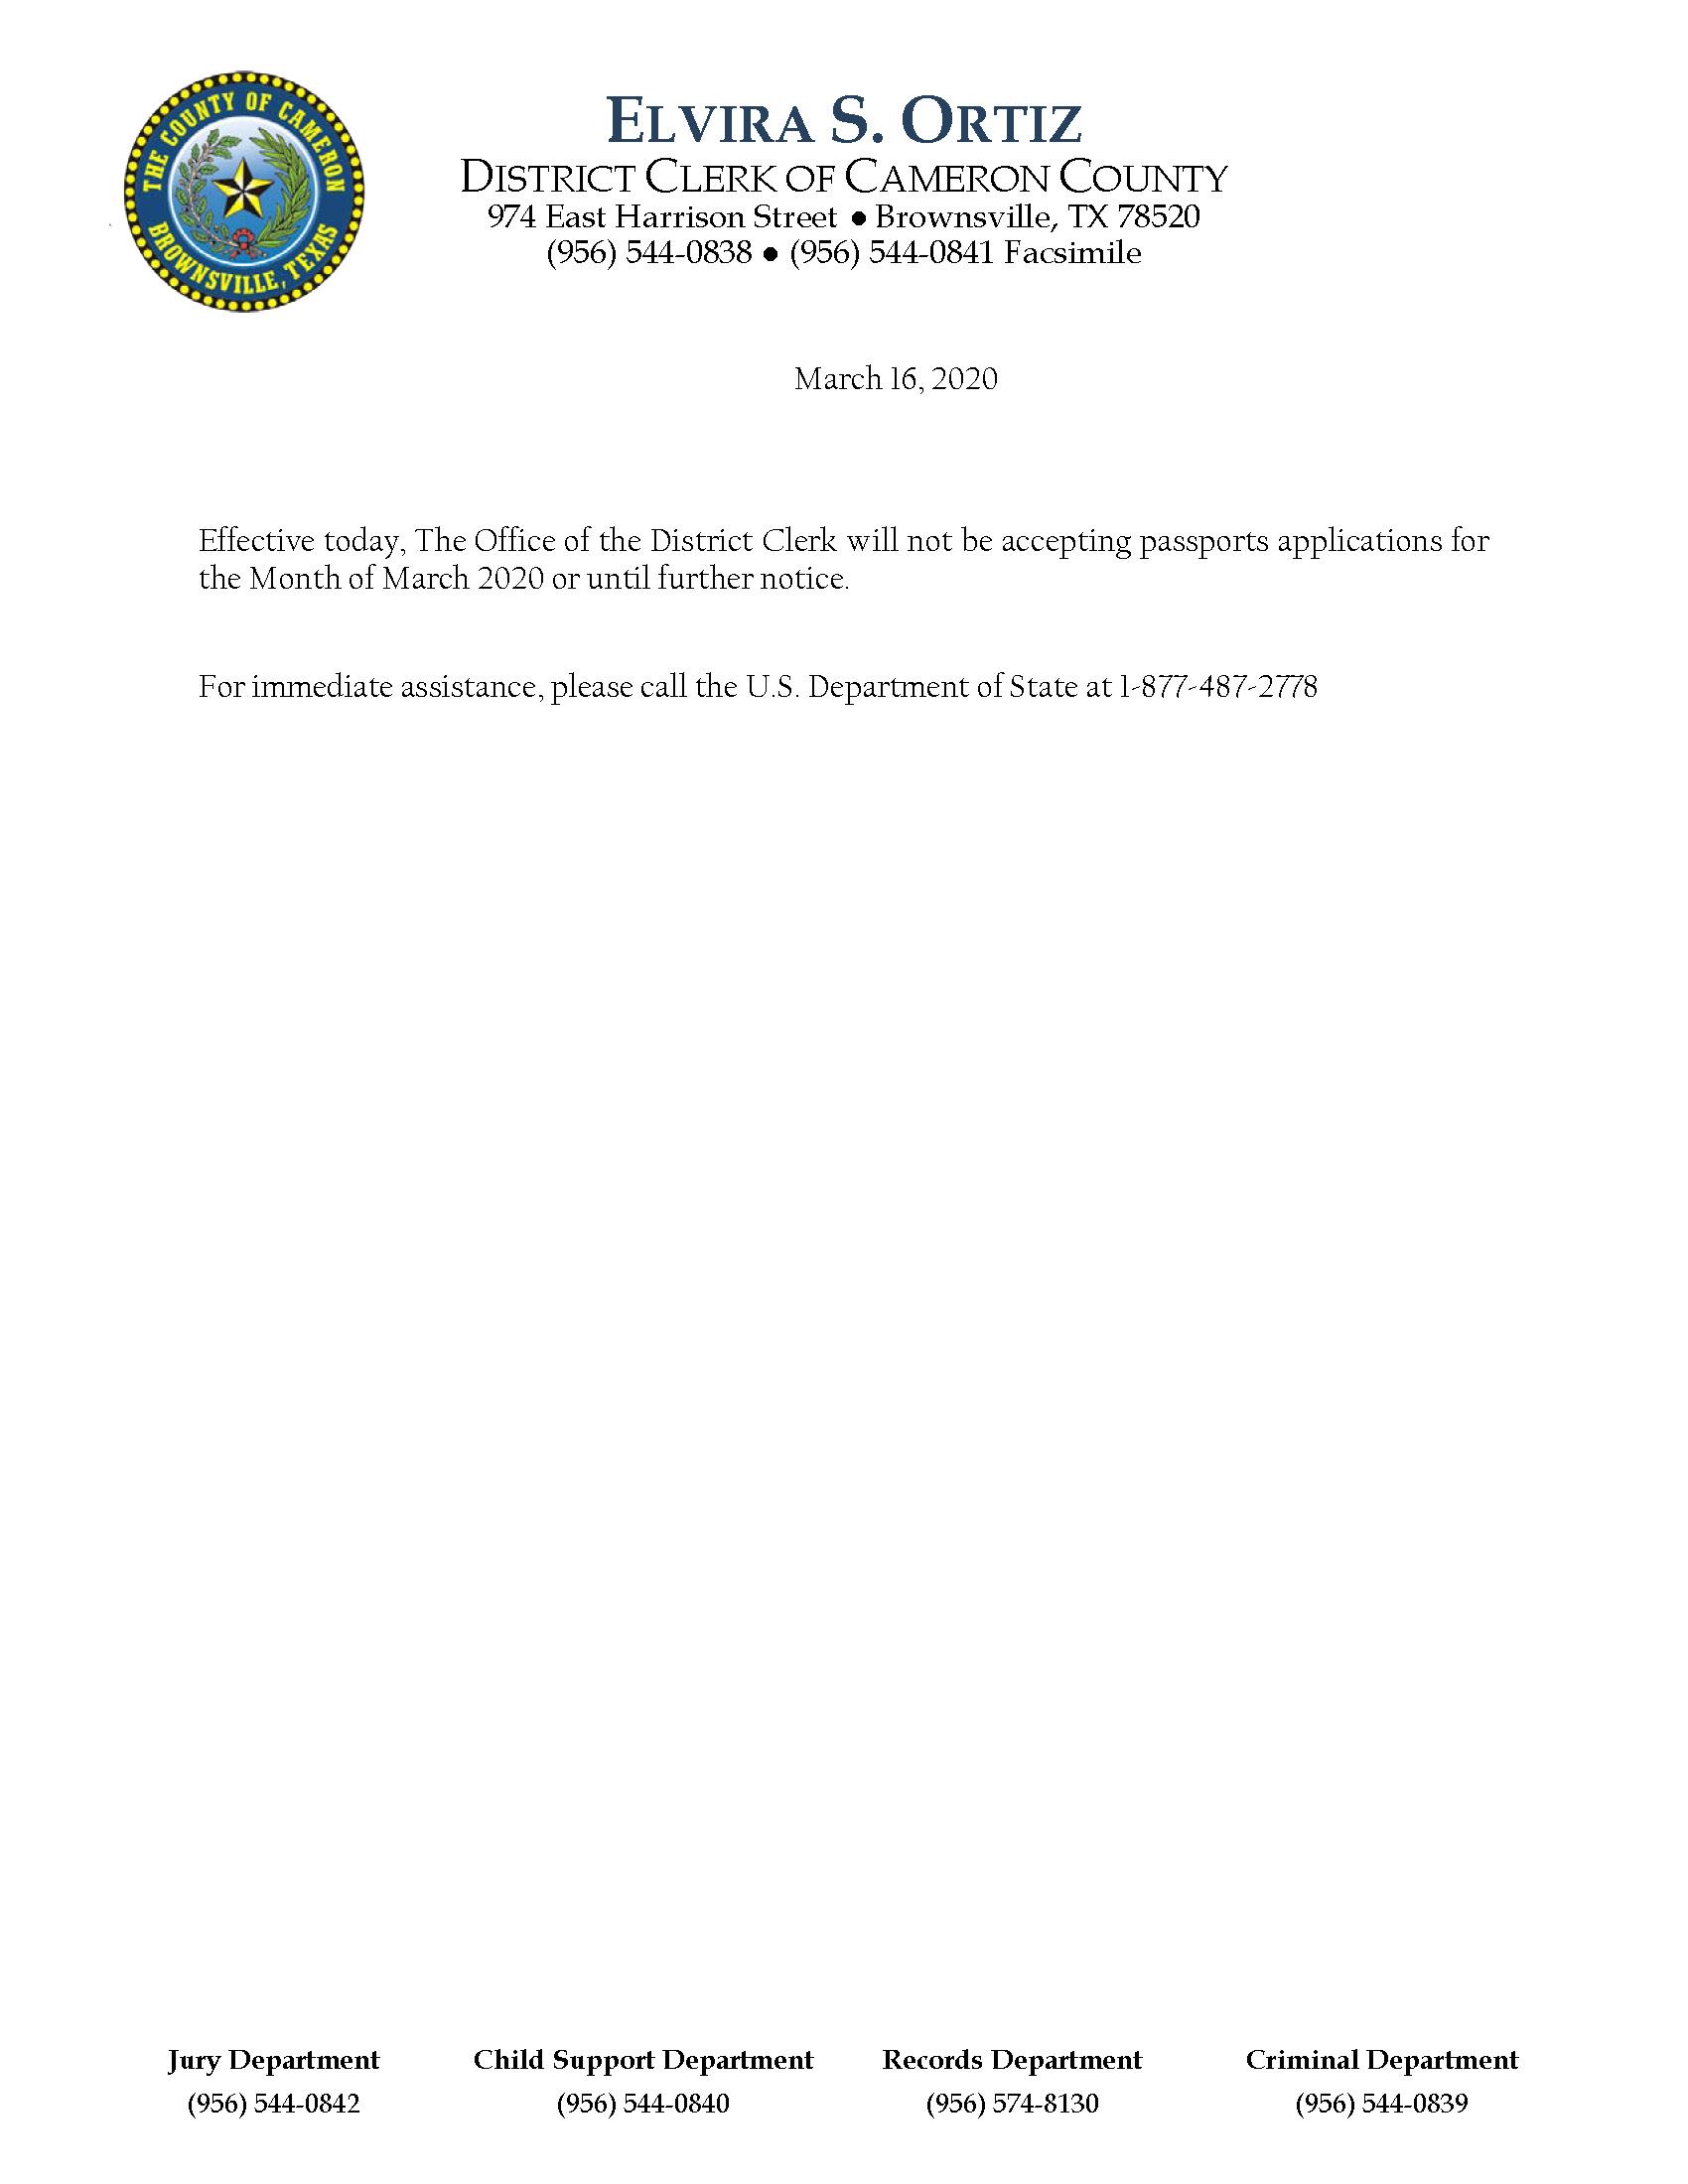 Passports Closure Notice 2020